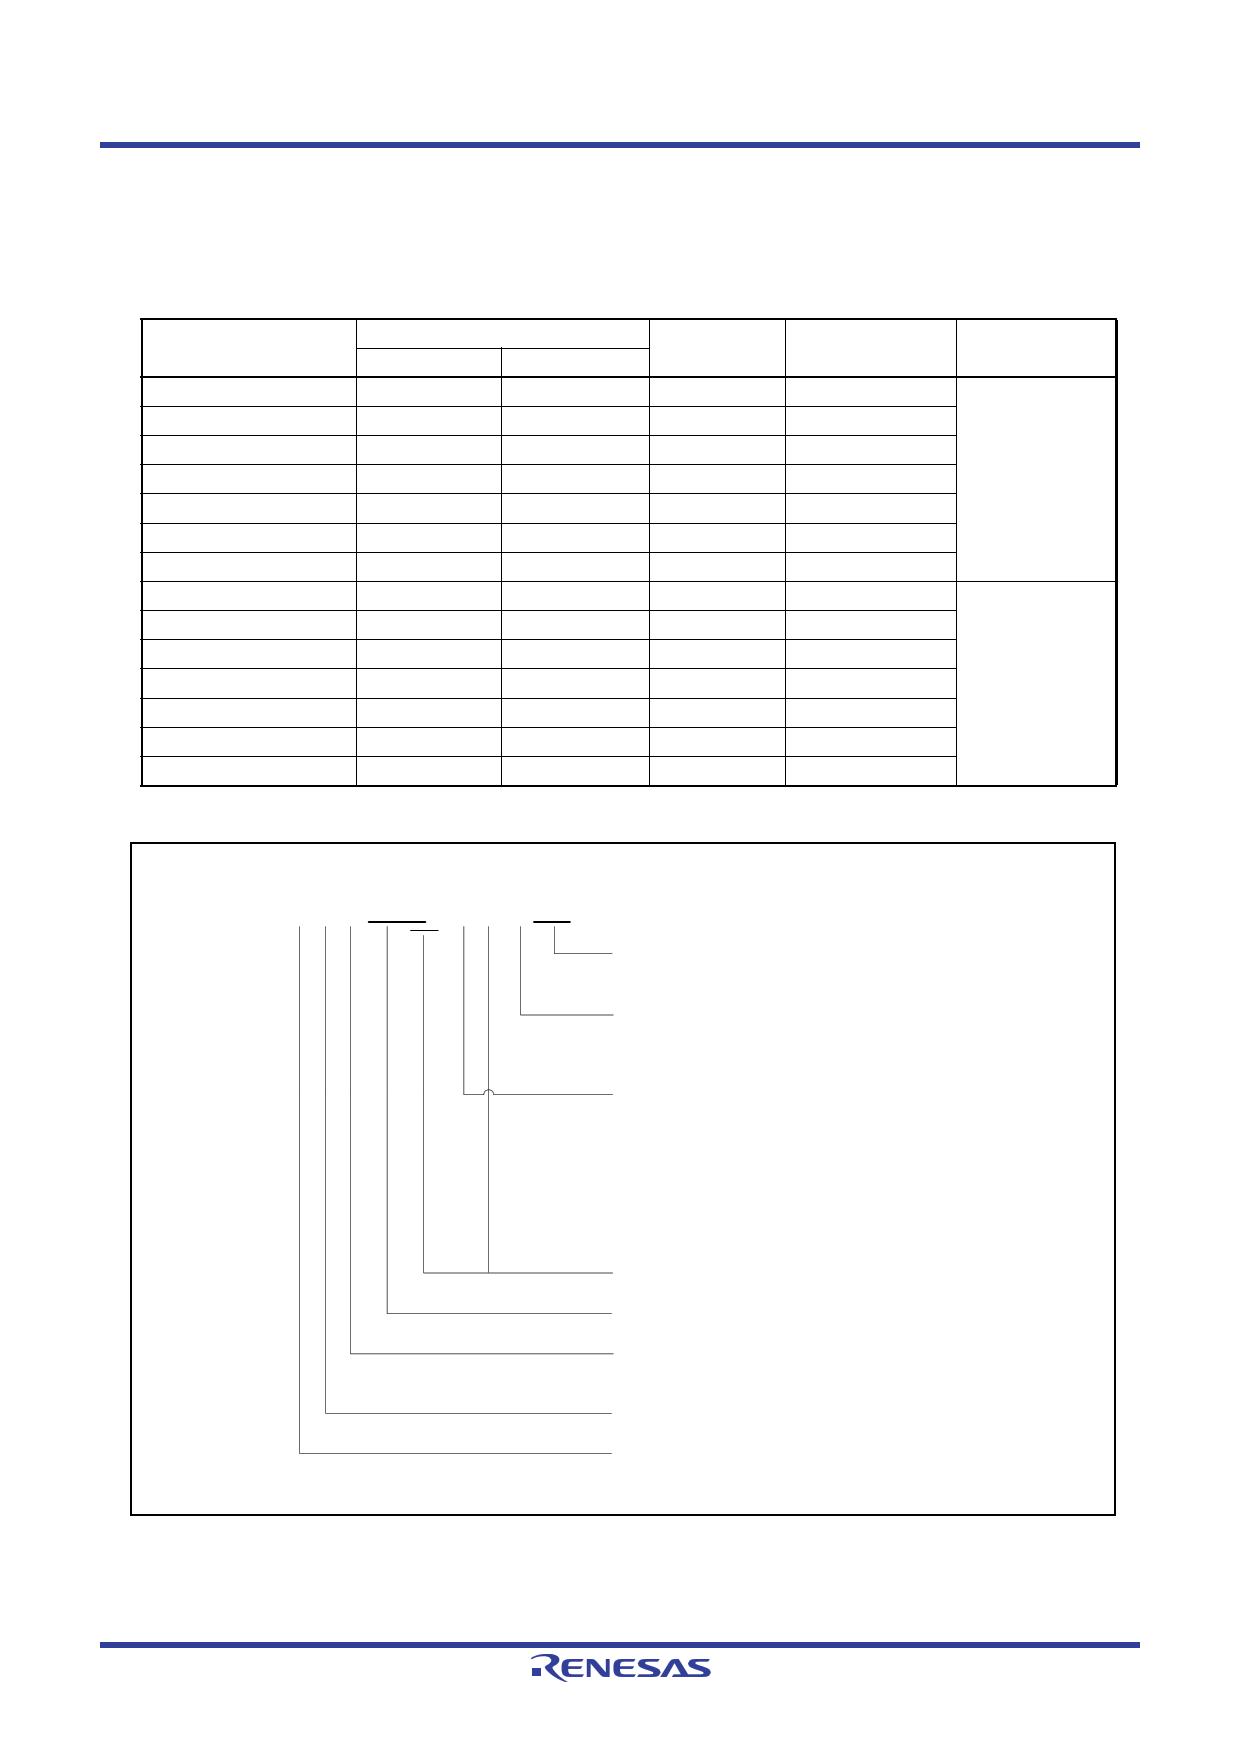 R5F21358CNFP pdf, 반도체, 판매, 대치품